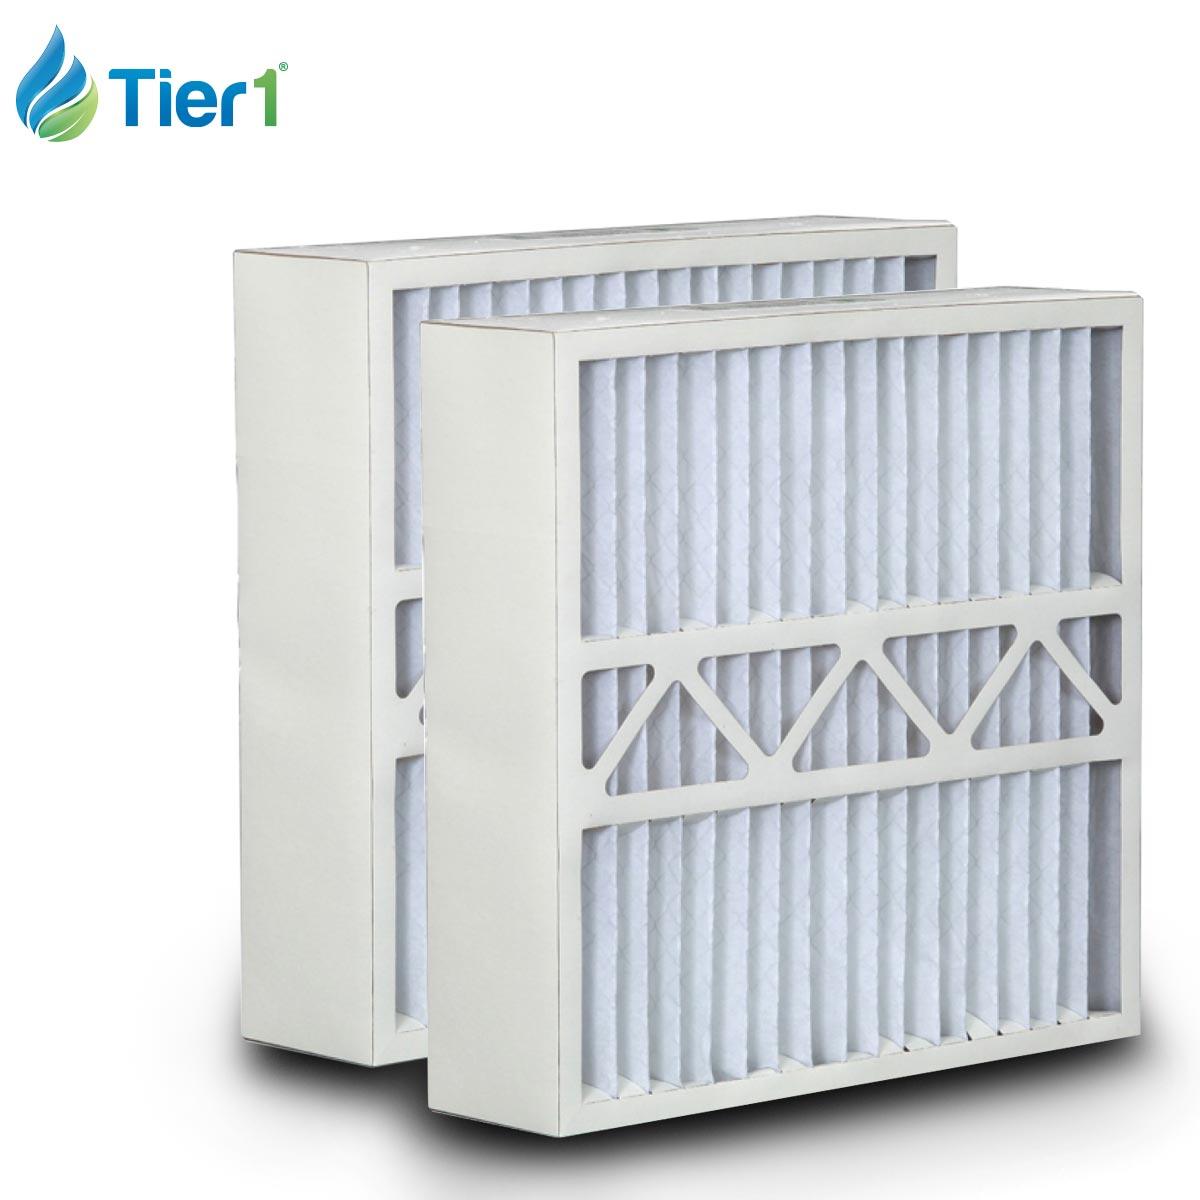 Tier1 Replacement for Goodman 20x20x5 Merv 11 G5-2020 Air Filter 2 Pack